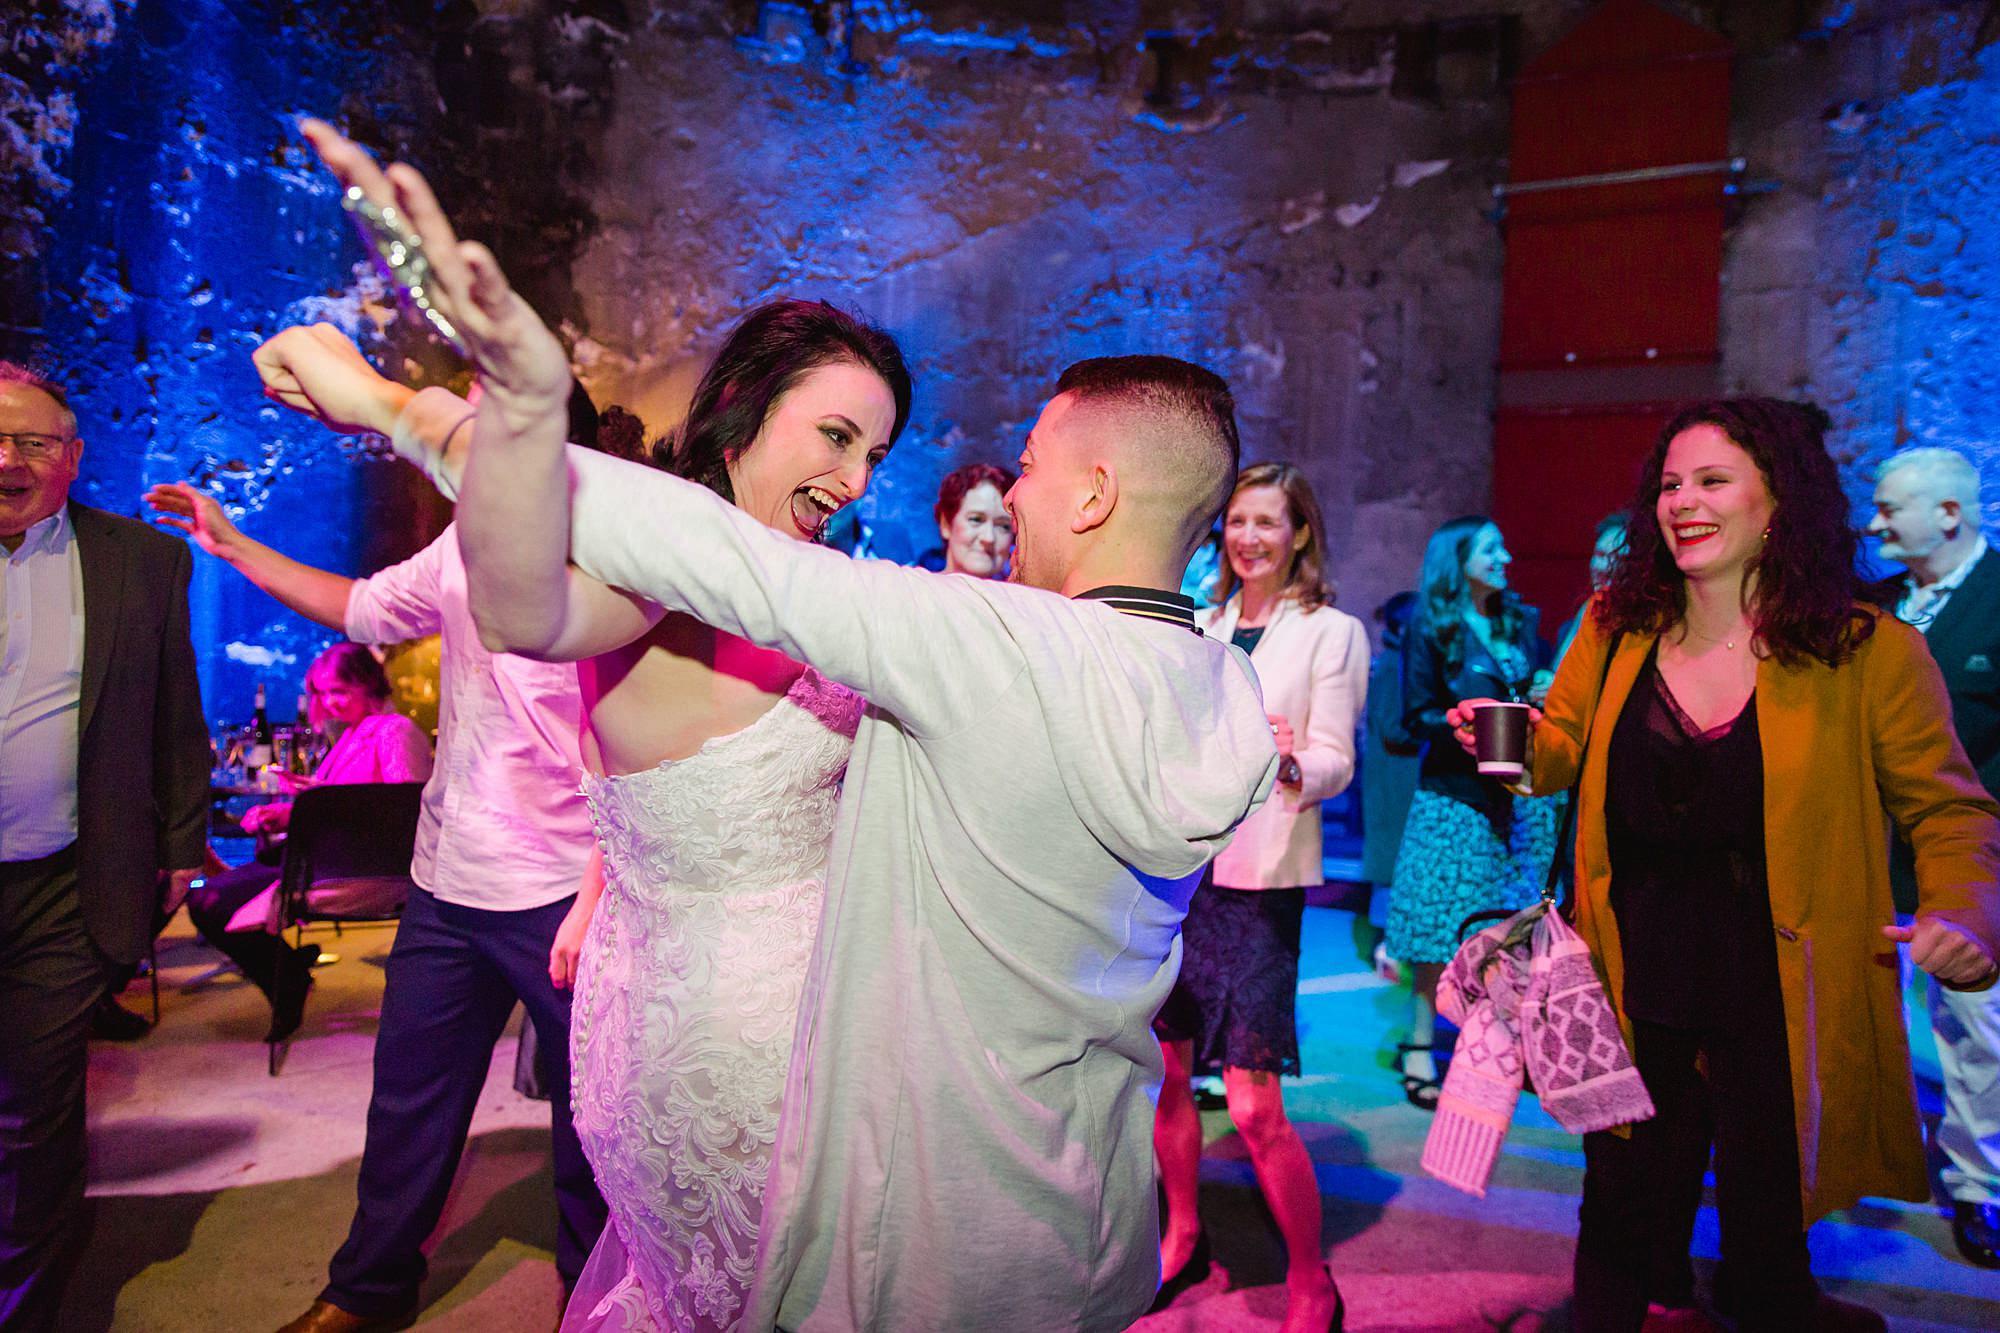 Brunel museum wedding guest dances with bride